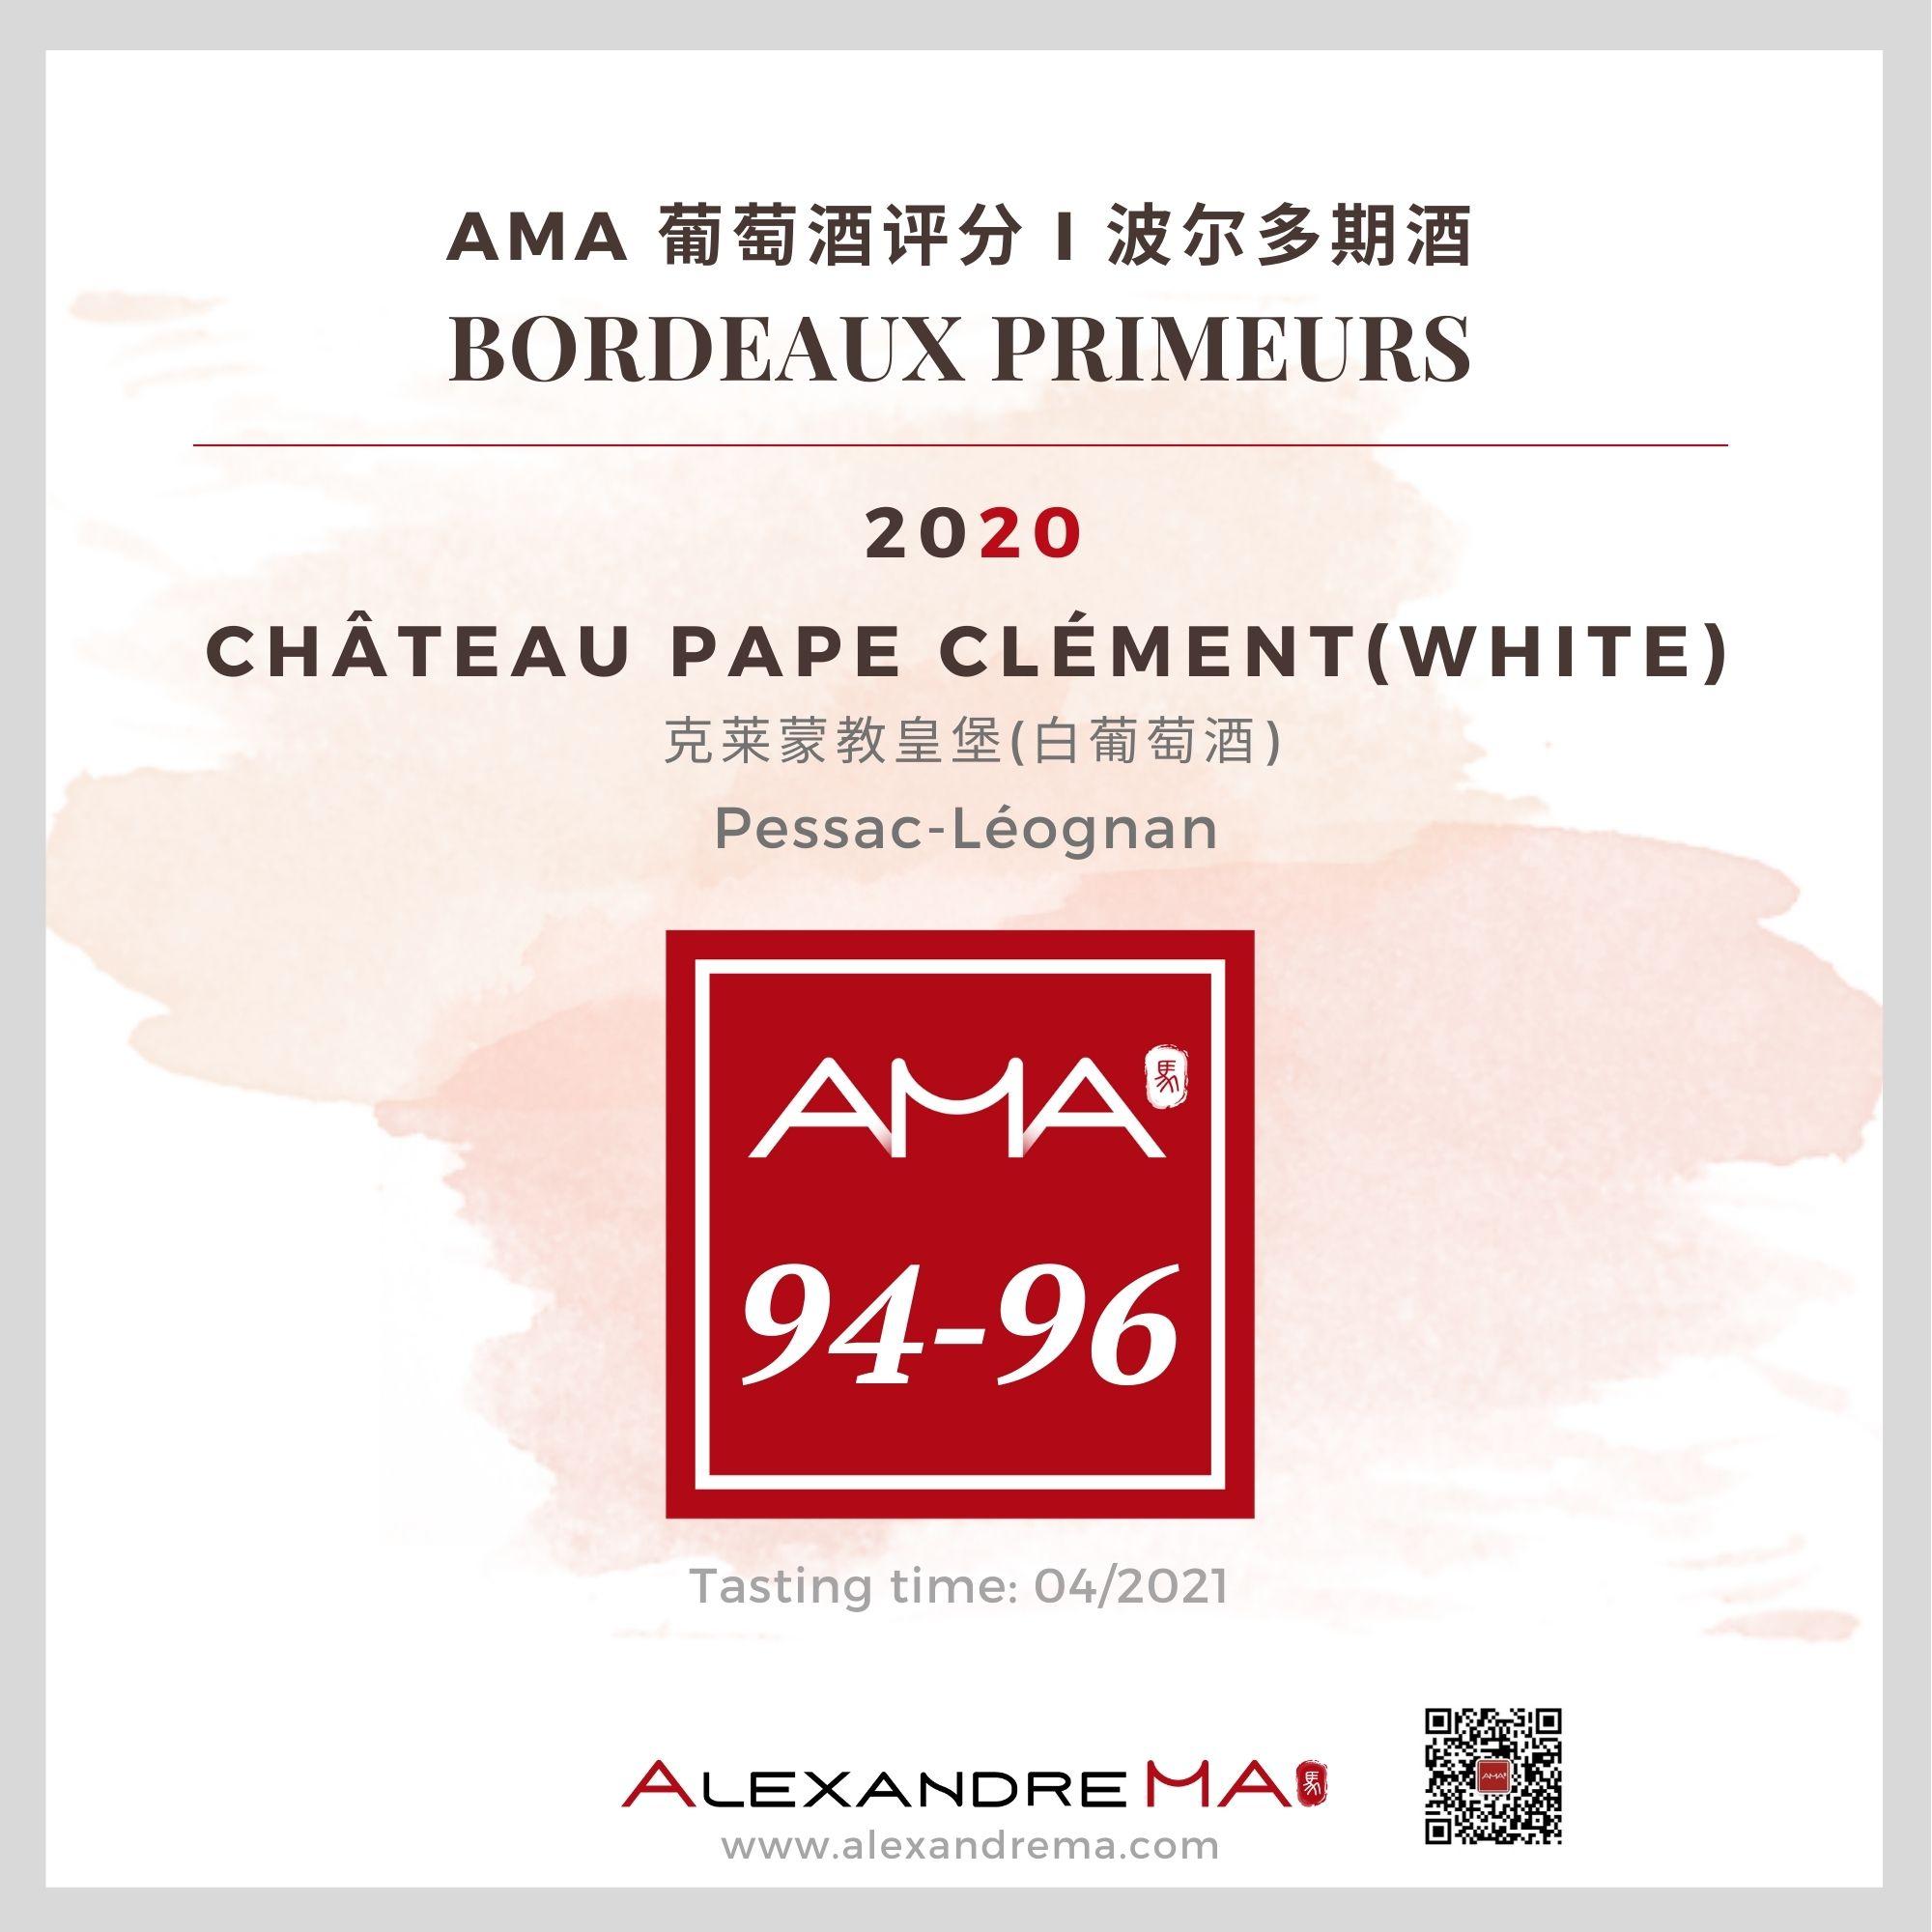 Château Pape Clément White 2020 克莱蒙教皇堡 - Alexandre Ma